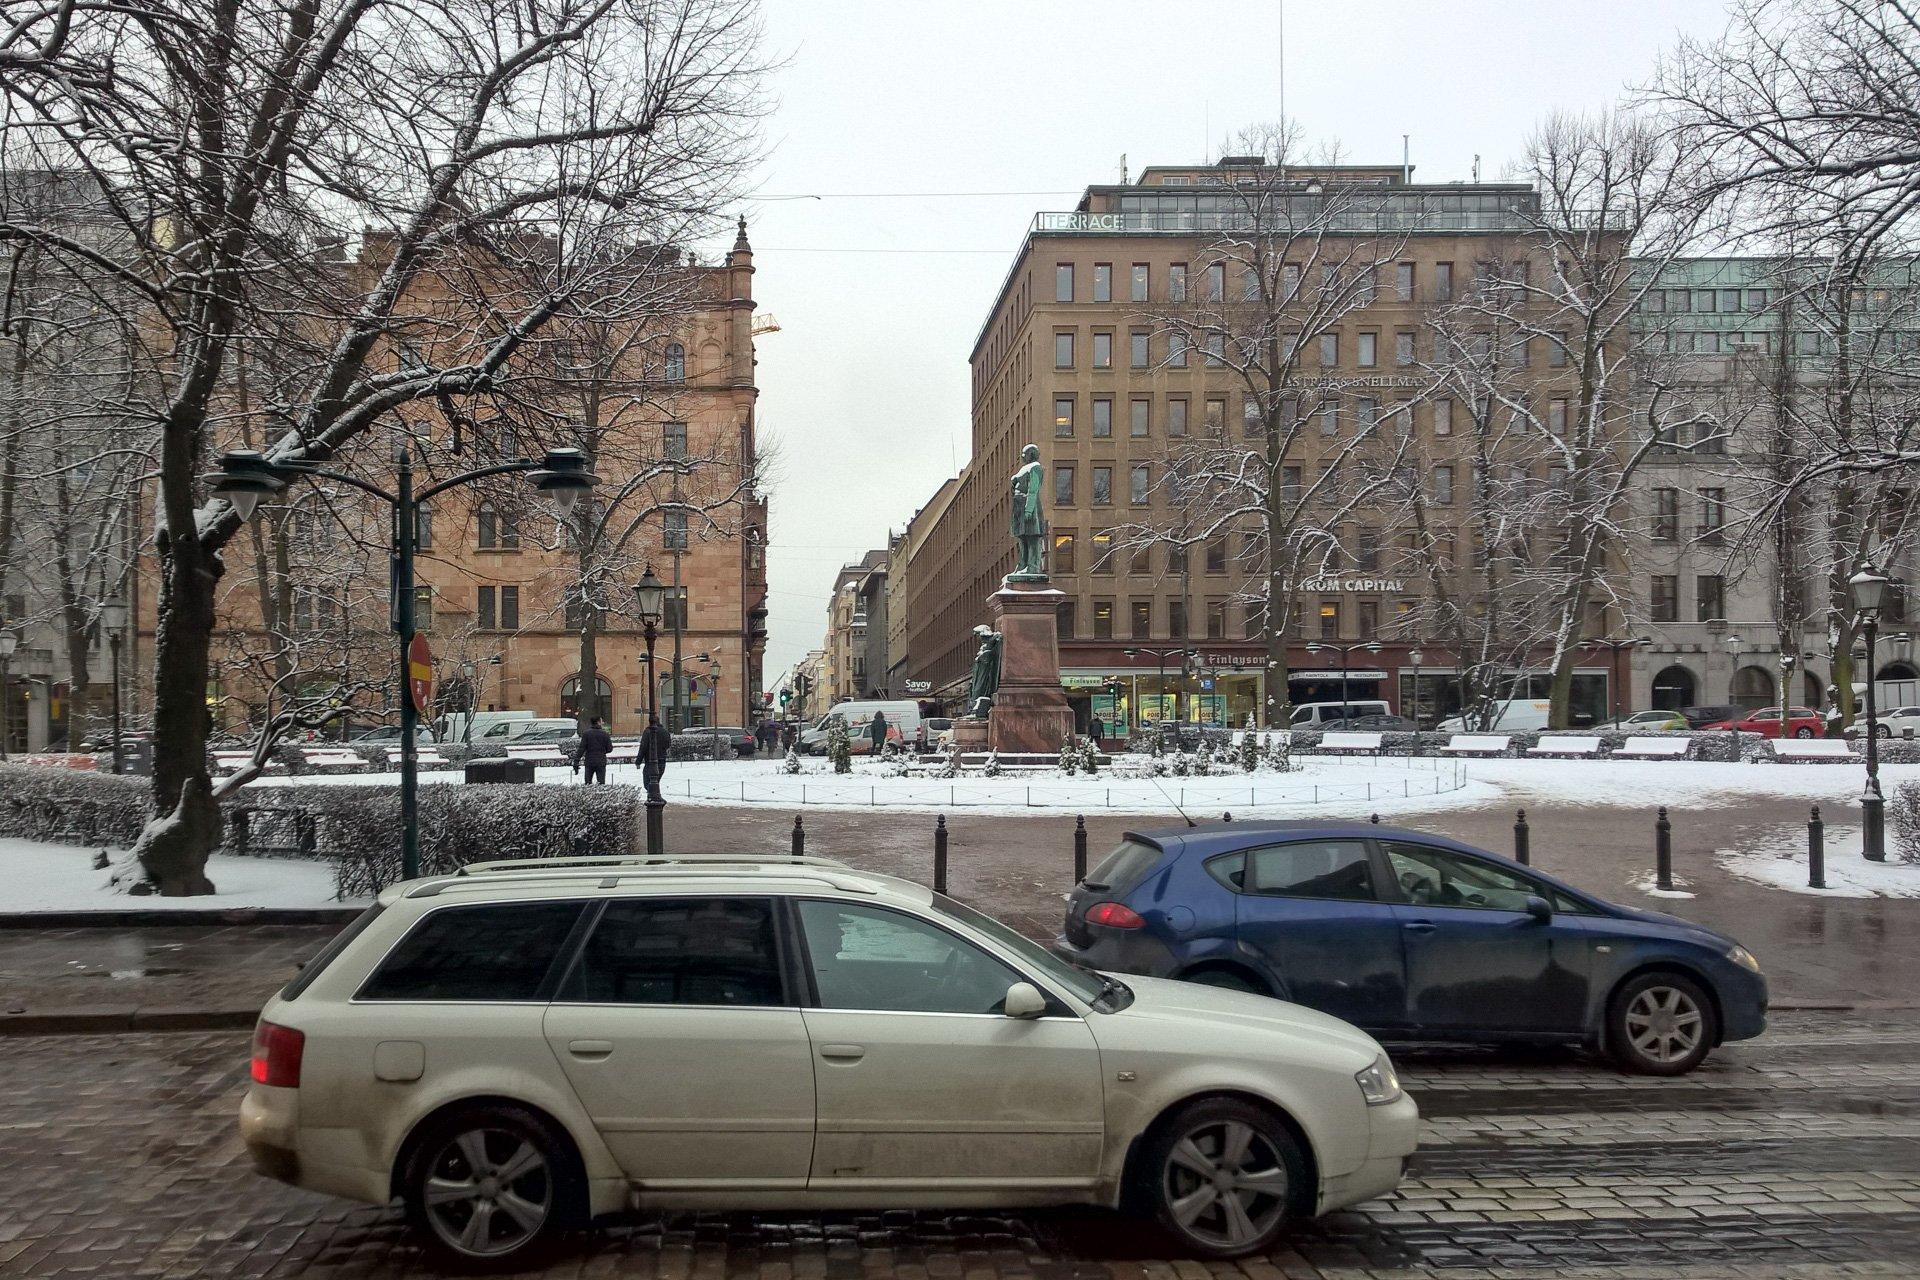 vpPHOTOGRAPHY_170331_Helsinki_WEB_0006